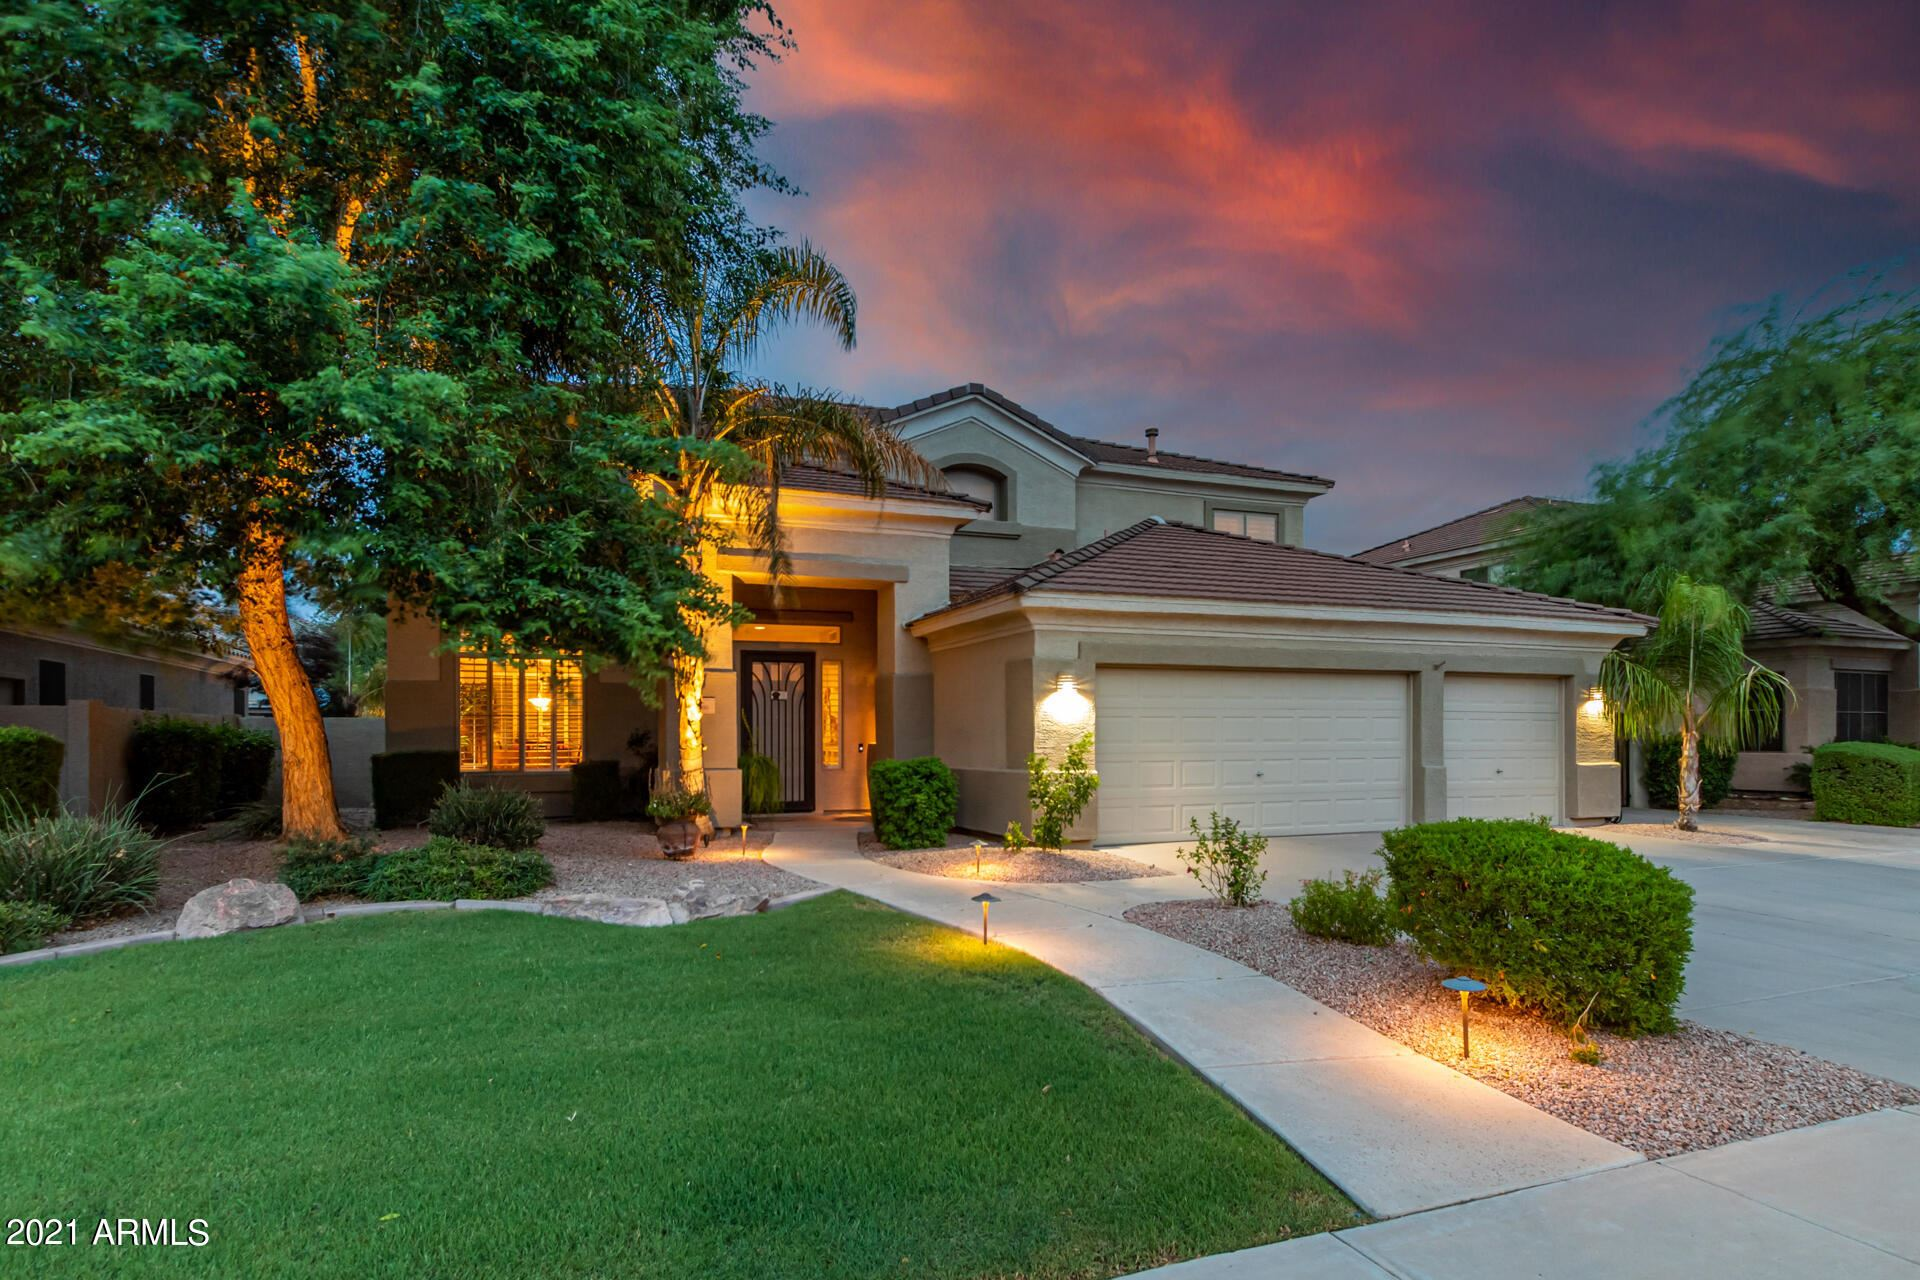 Photo of 1490 E SAGEBRUSH Street, Gilbert, AZ 85296 (MLS # 6269073)